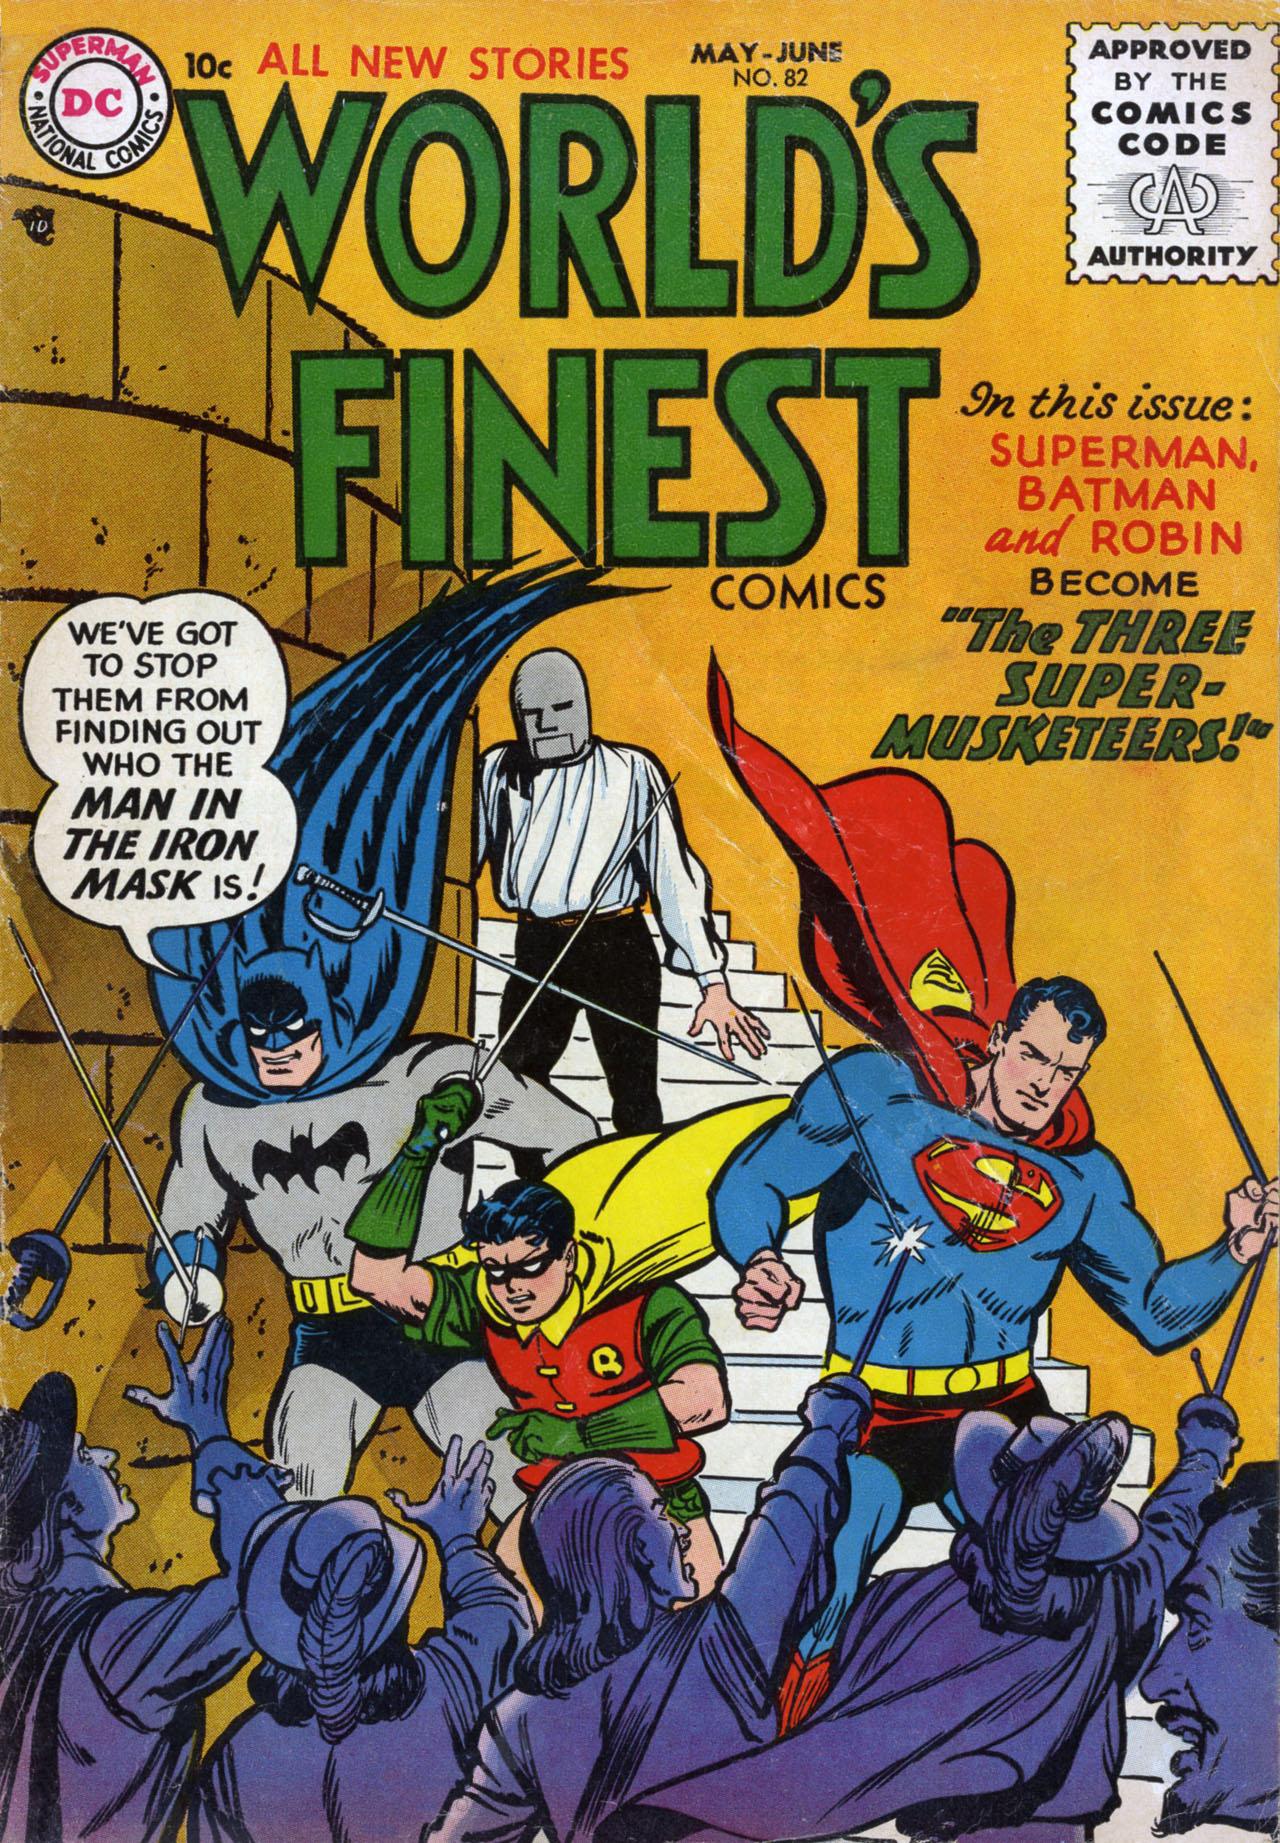 Read online World's Finest Comics comic -  Issue #82 - 1